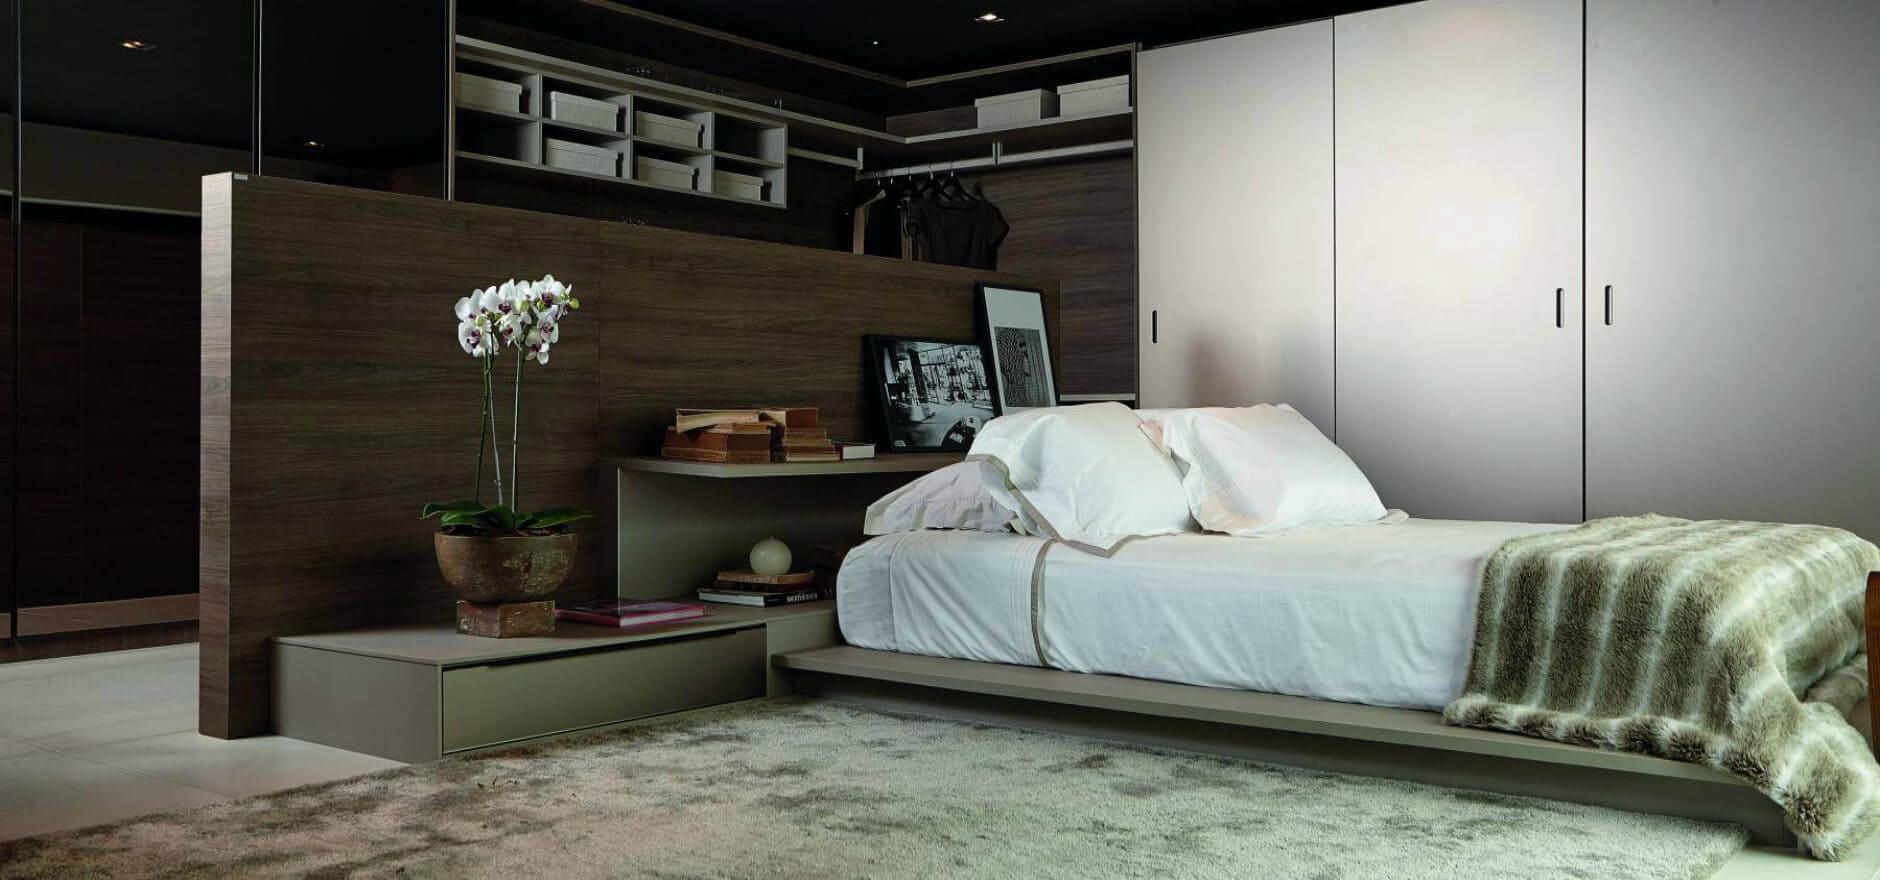 Dormitório Dell Anno Curitiba Móveis Planejados Cama Baixa 1